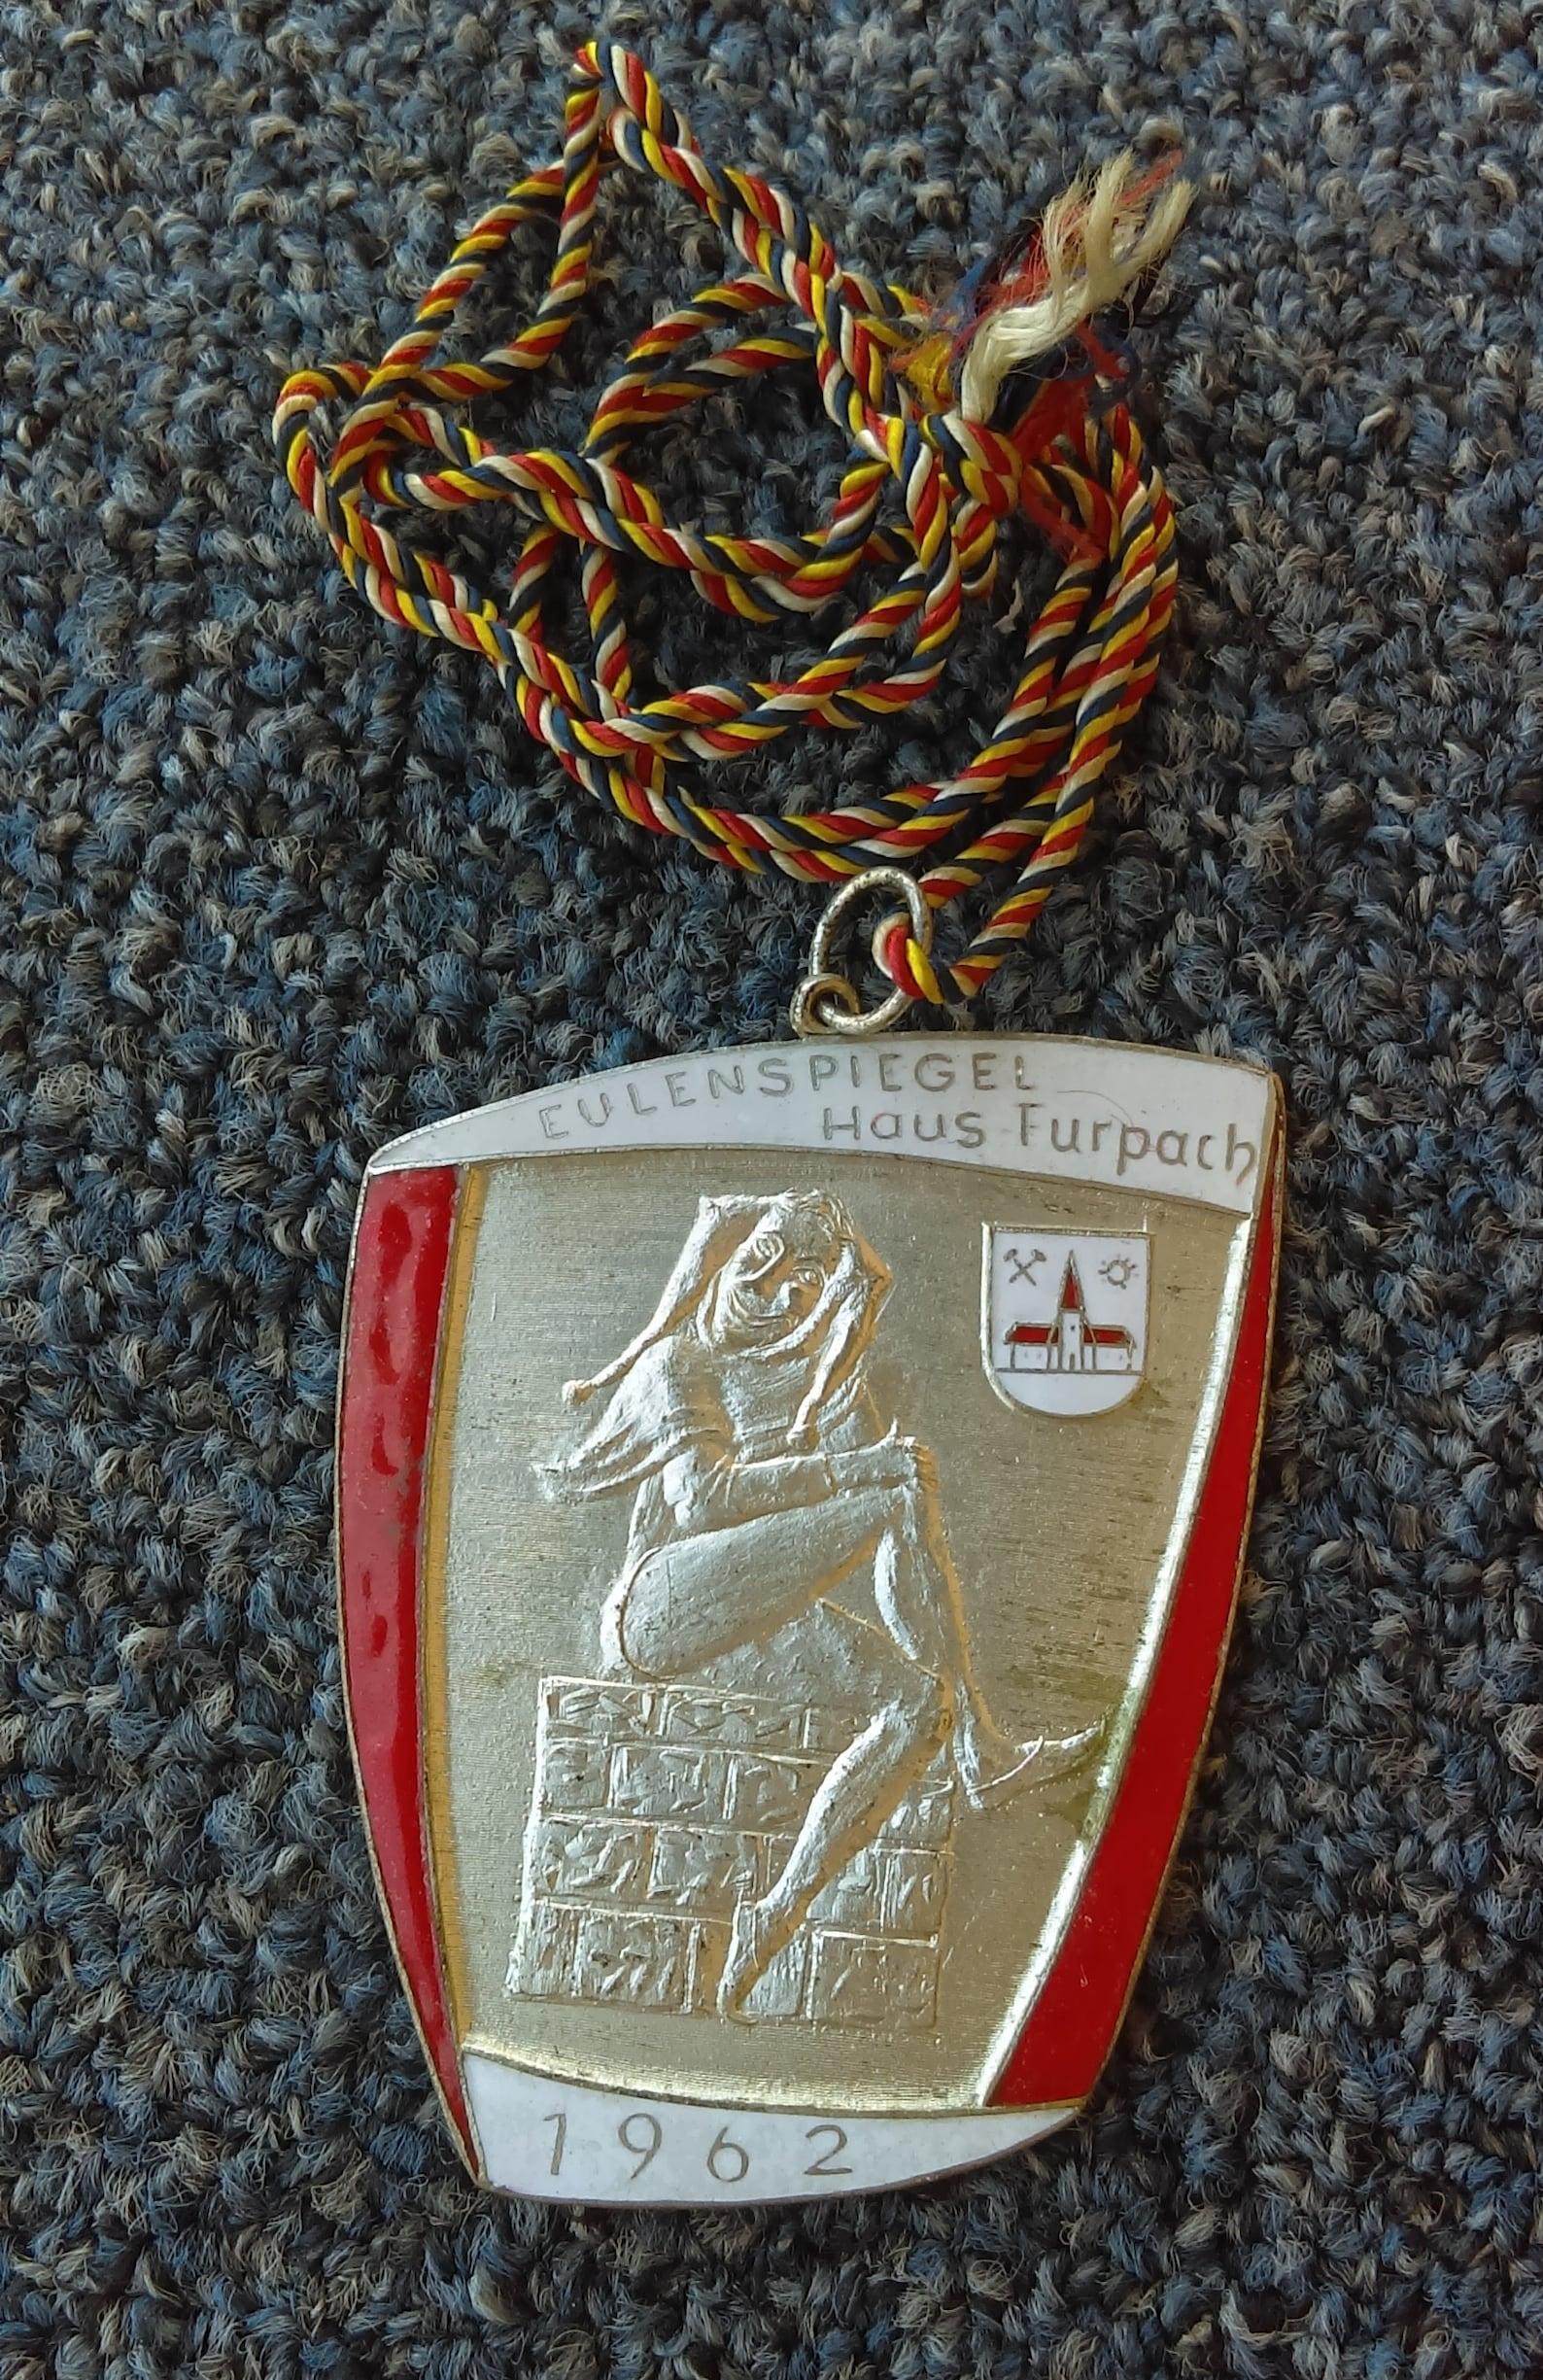 Carnival, Karnevalsverein Eulenspiegel Haus Furpach 1962. vintage badge, medal